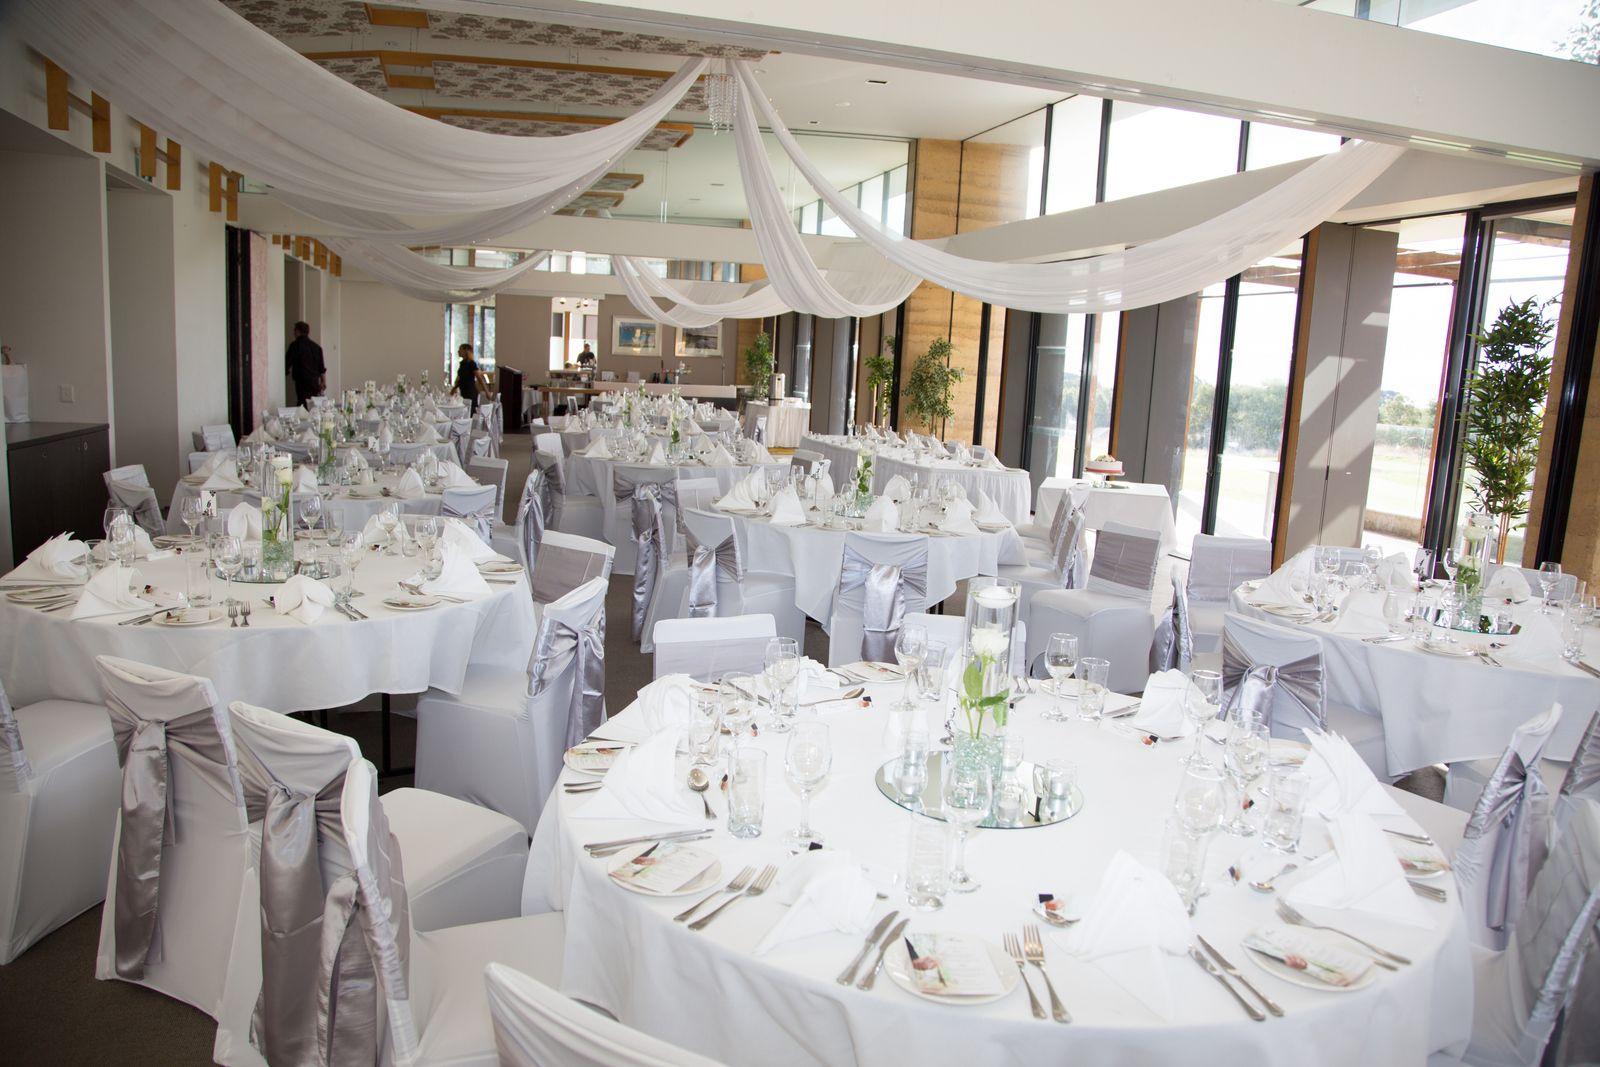 Wedding Room Set Up #roomsetup #wedding #centerpieces #decorations ...